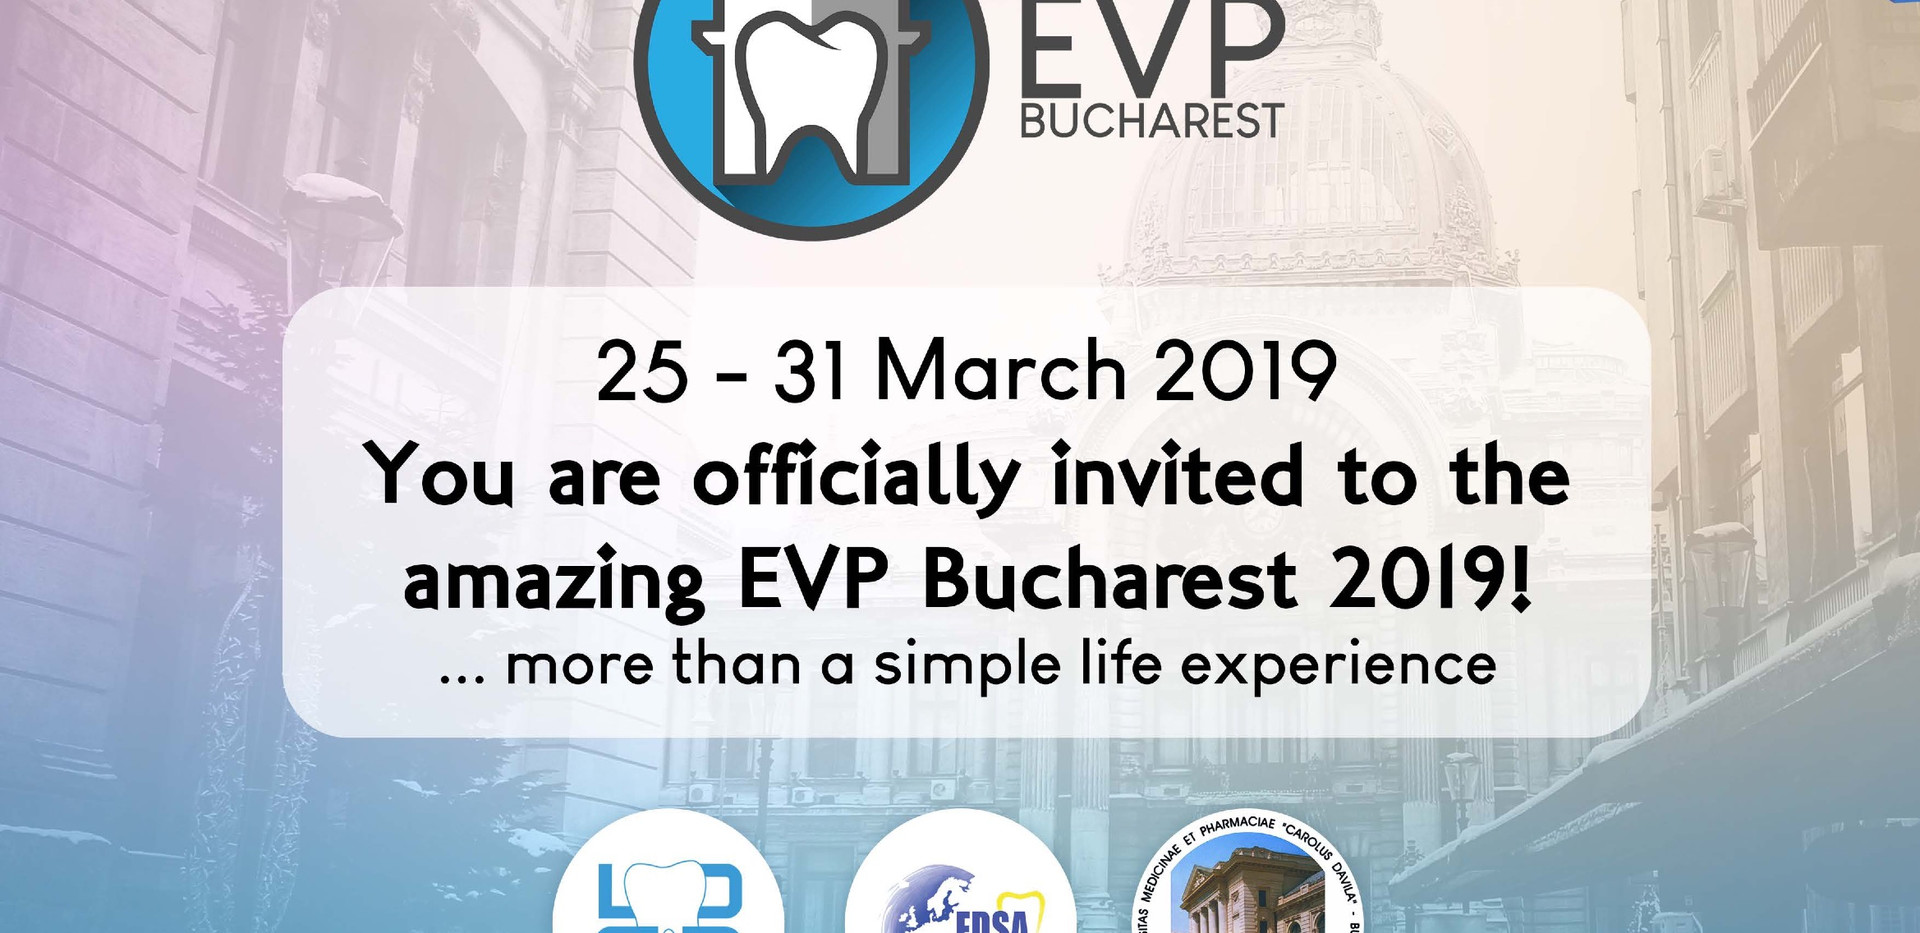 BrochureEVP2019 1_9_2019.jpeg